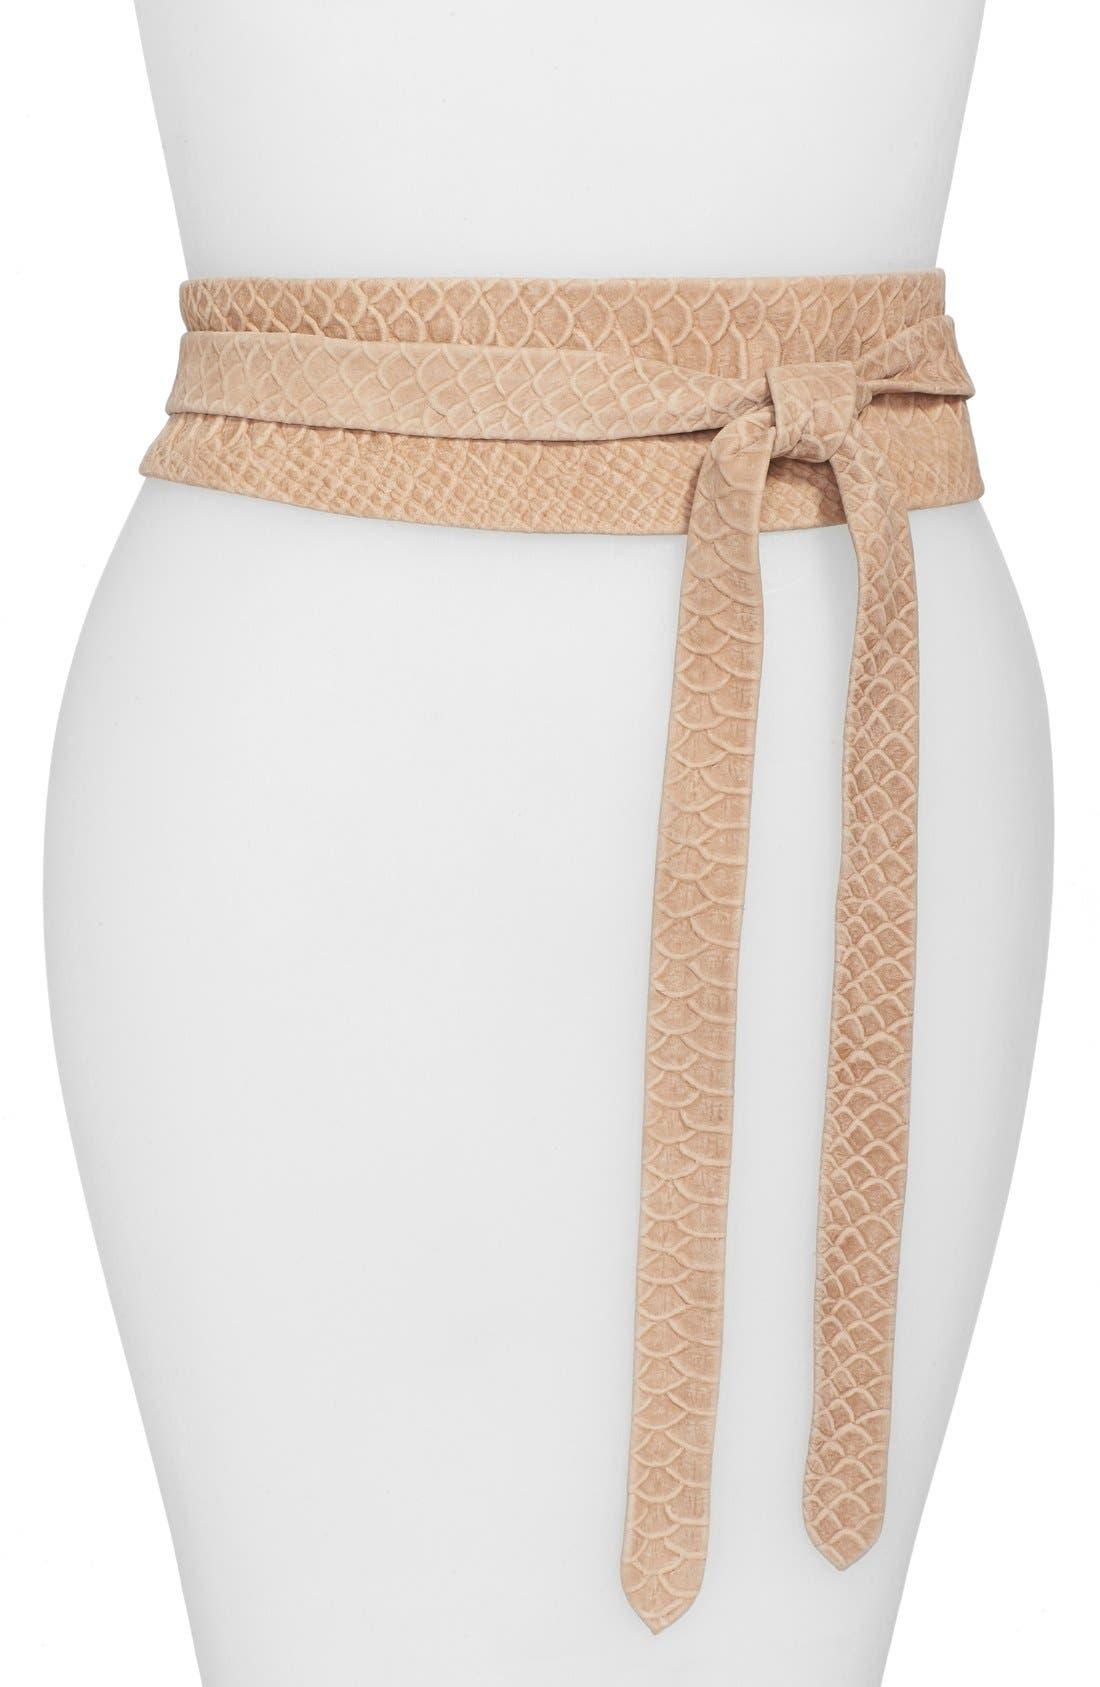 Alternate Image 1 Selected - Ada 'Obi' Leather Wrap Belt